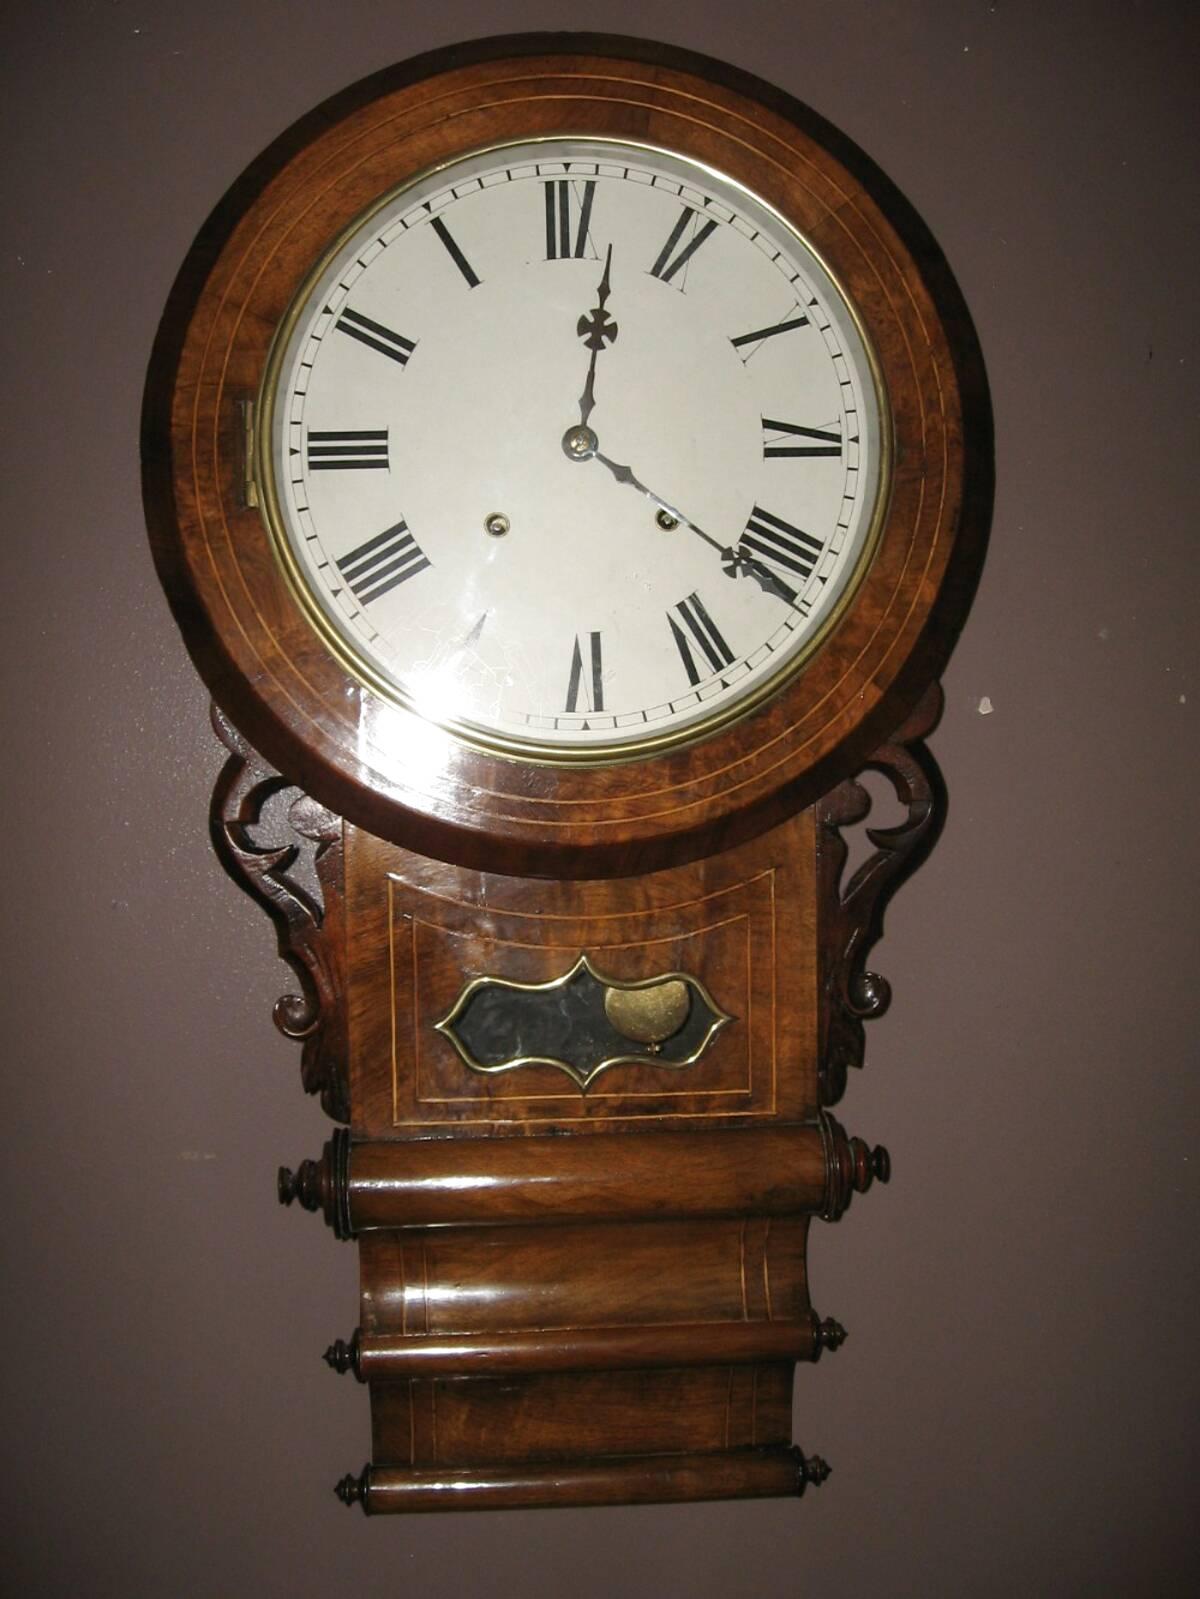 Drop Dial Clock For Sale In Uk 59 Used Drop Dial Clocks